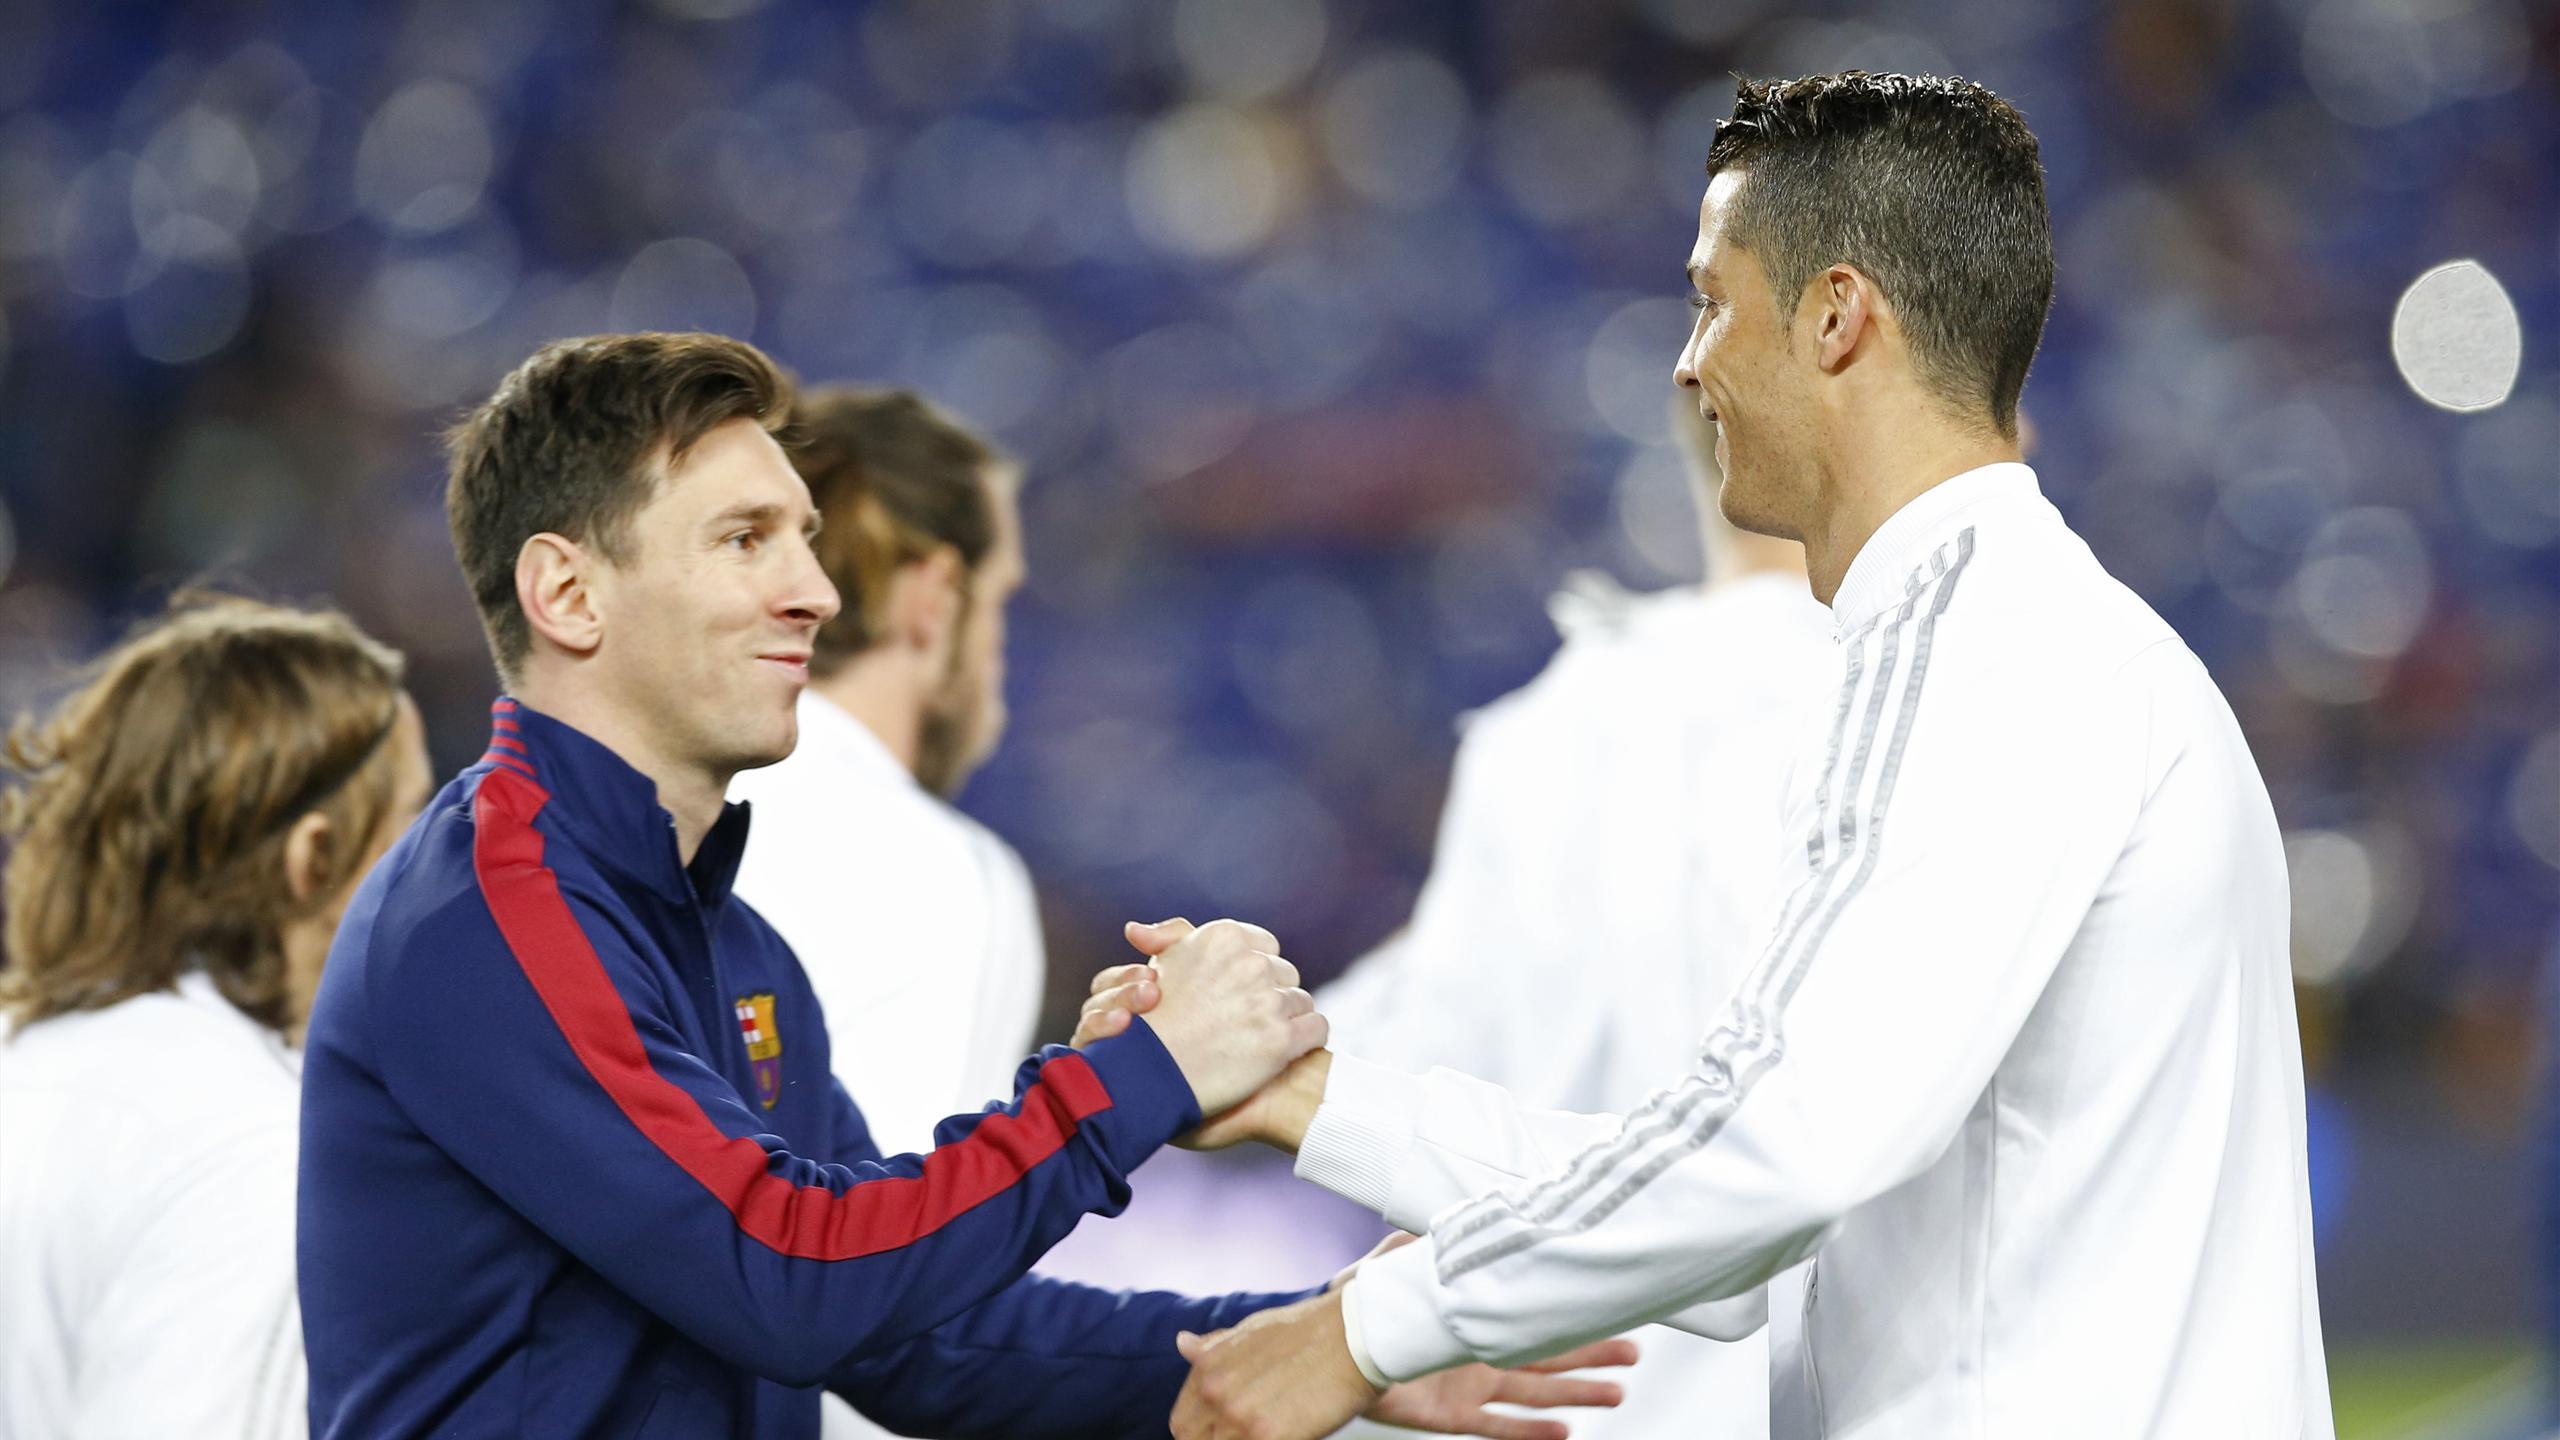 Barcelona's Lionel Messi and Real Madrid's Cristiano Ronaldo